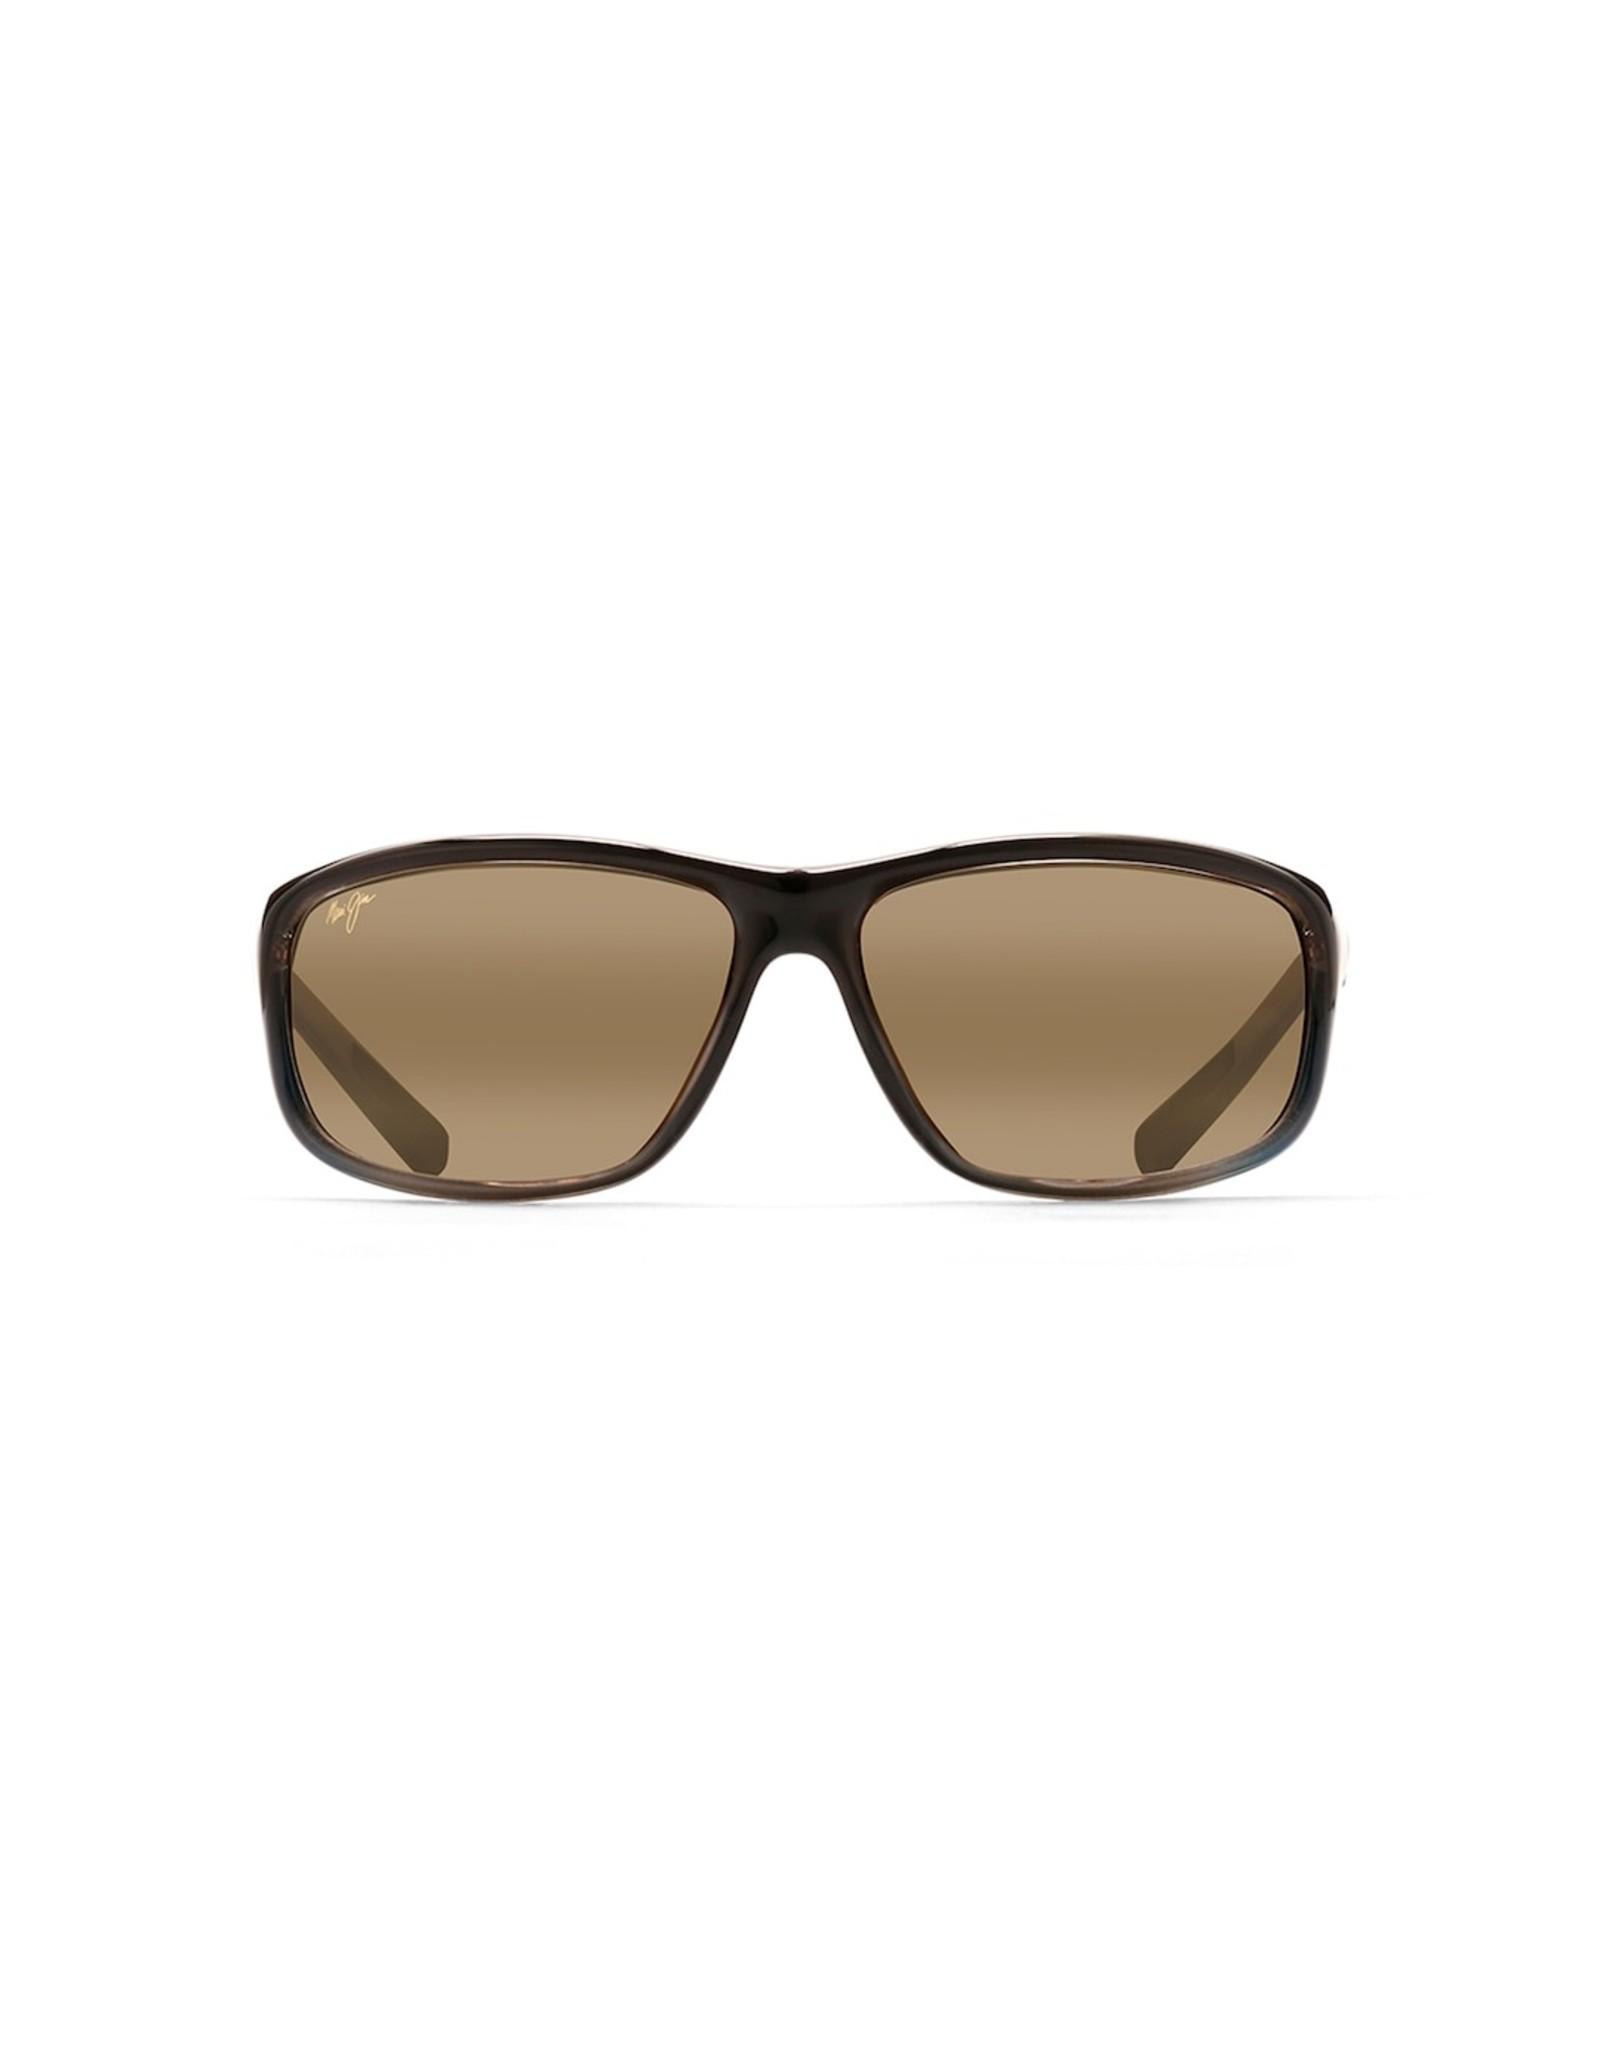 Maui Jim Maui Jim 'Spartan Reef' Sunglasses